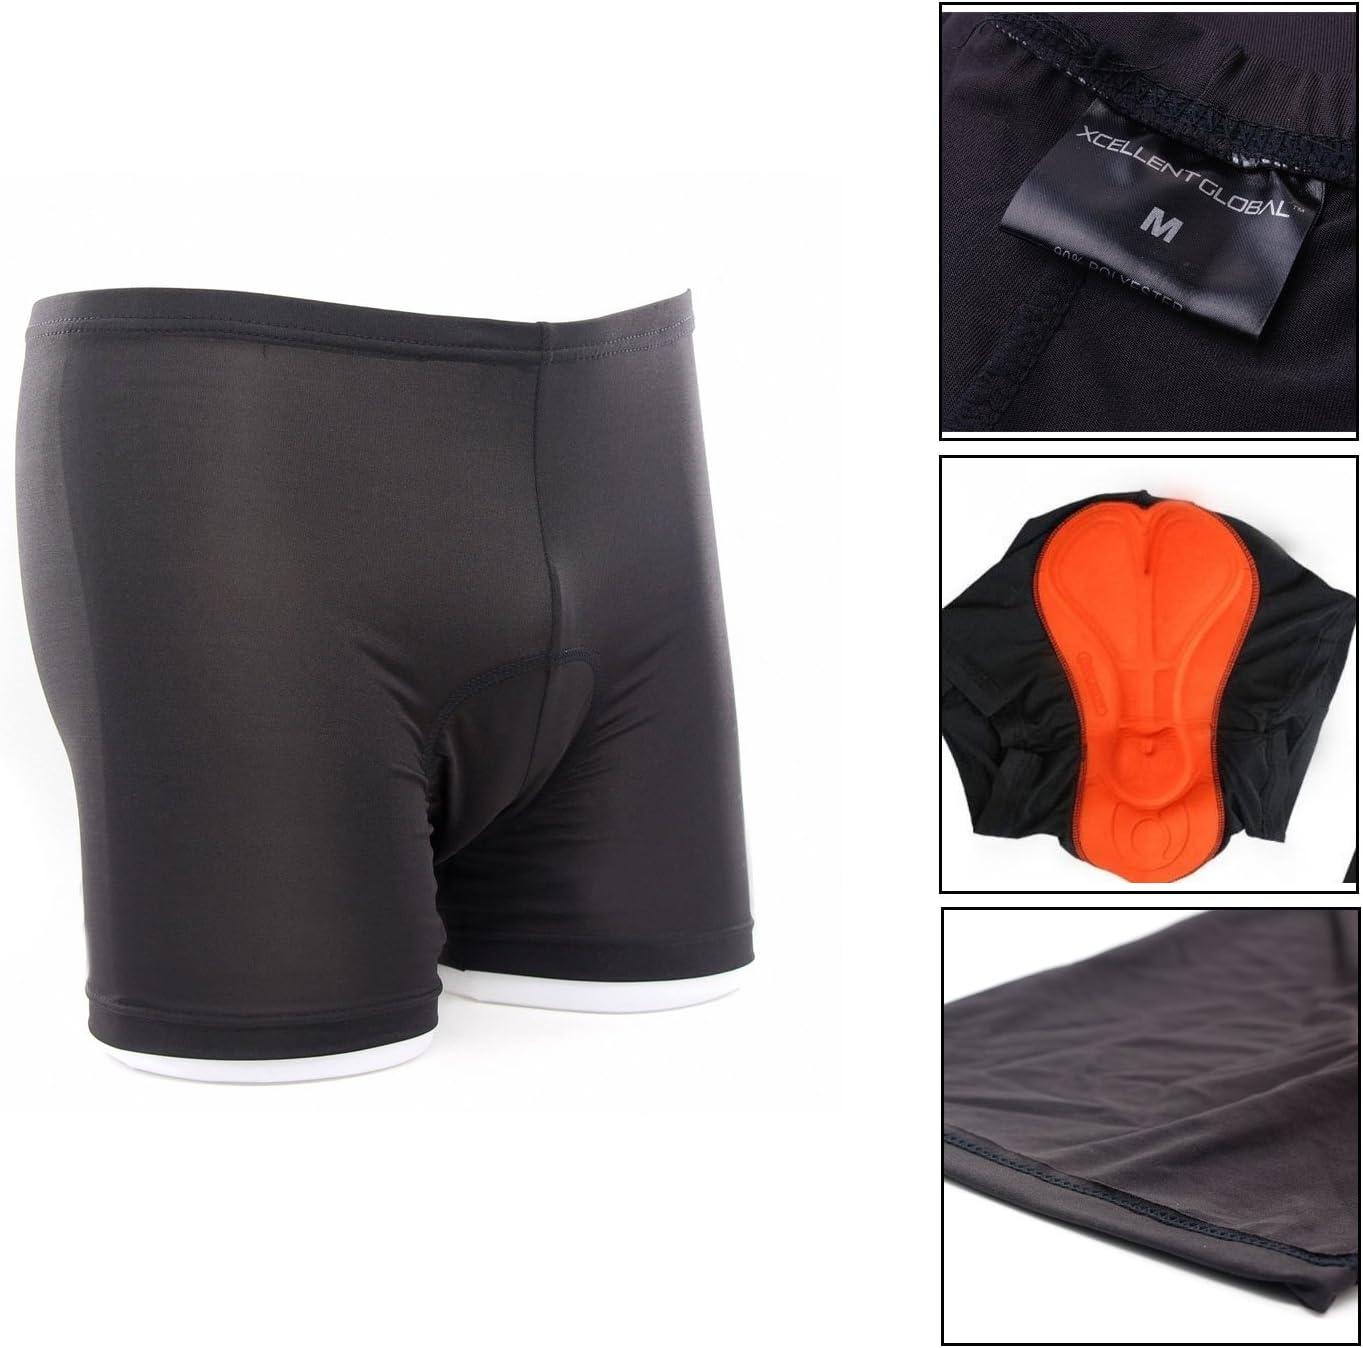 Xcellent Global Shorts Ropa Interior Almohadilla silic/ón Alta Permeabilidad Bicicleta//Ciclismo S//M//L//XL//XXL Size Available M-FS001